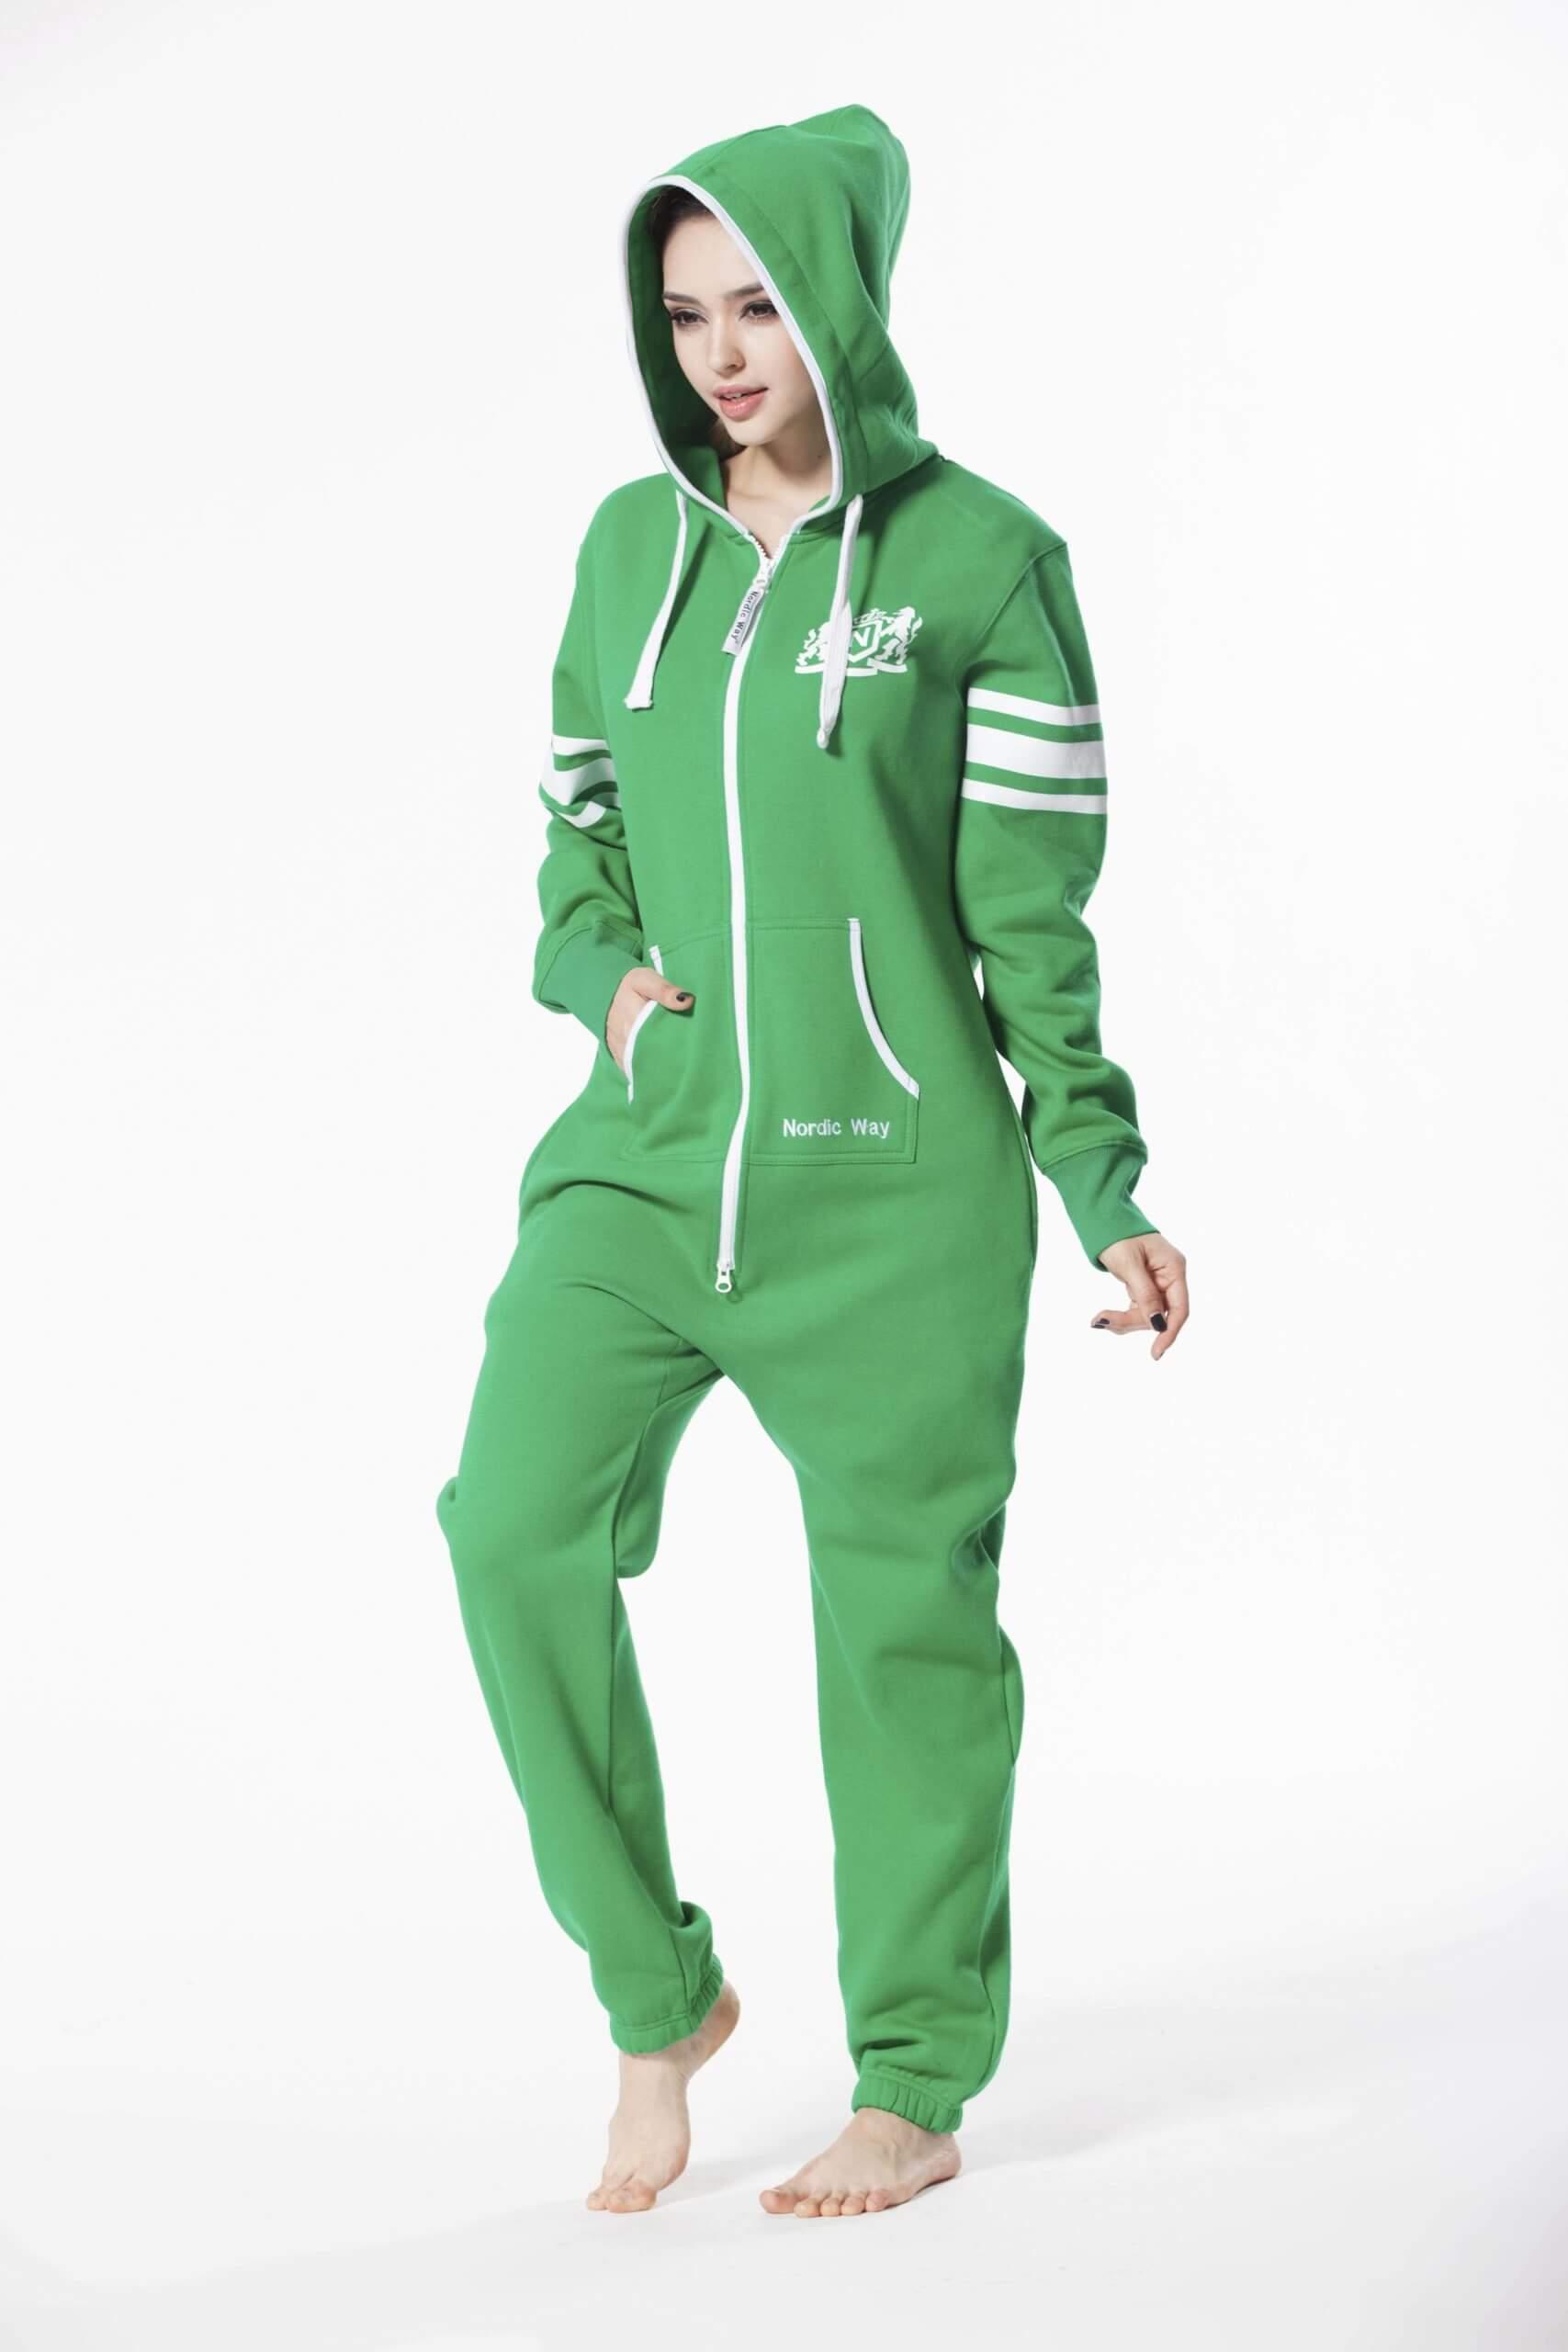 Nordic way College Green women onesie green printed